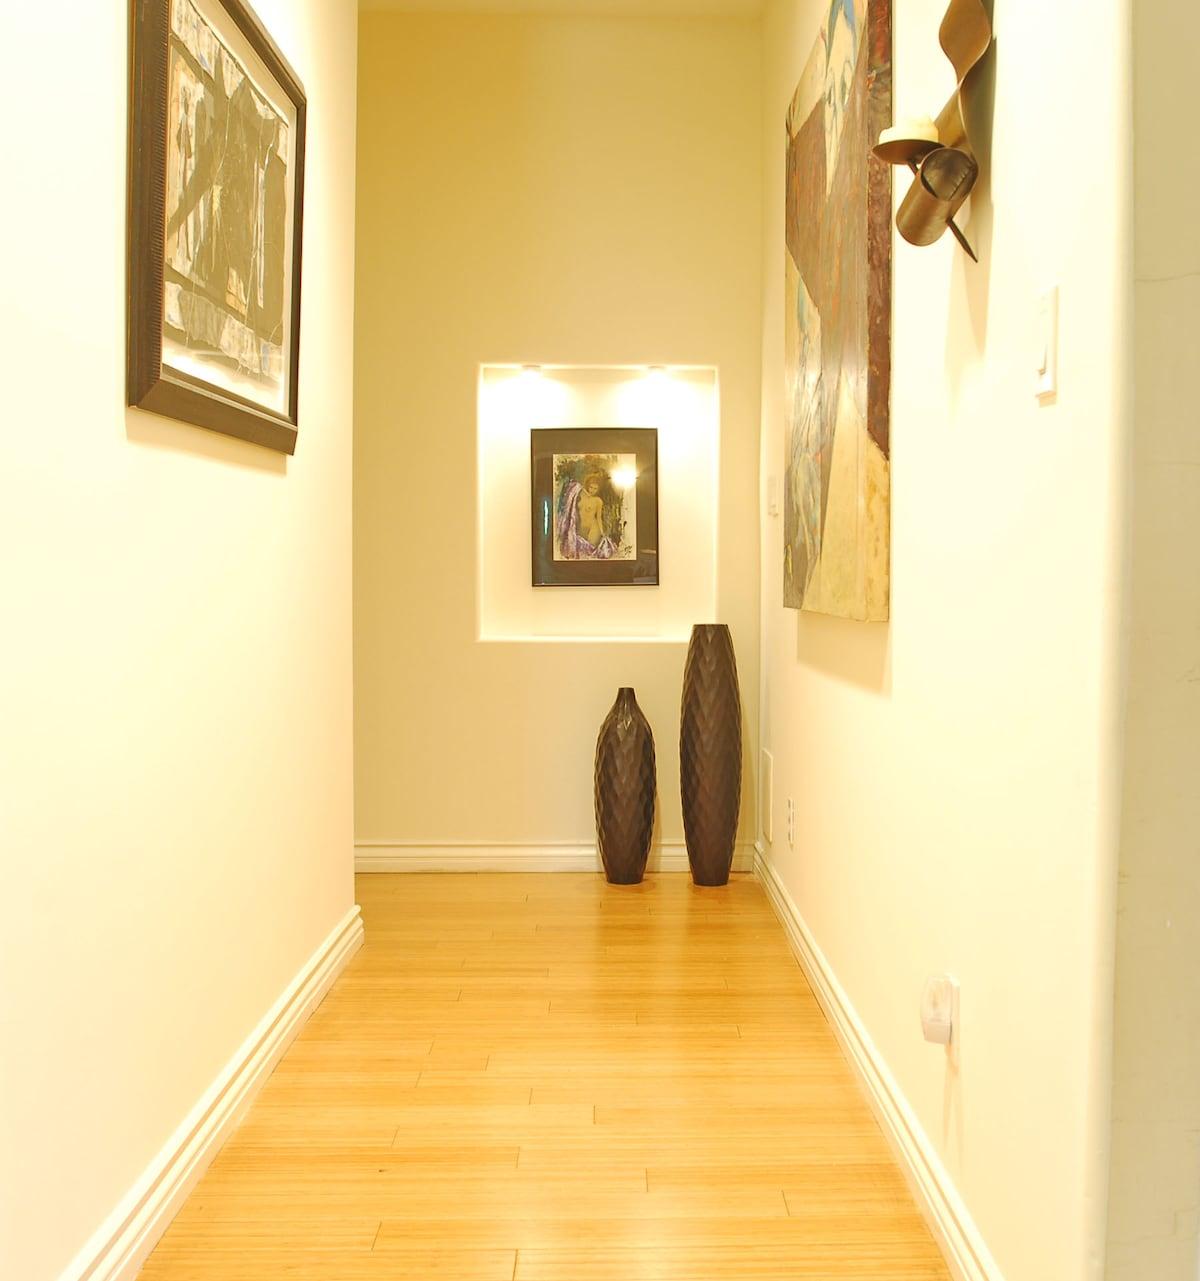 Hallway to Master Room